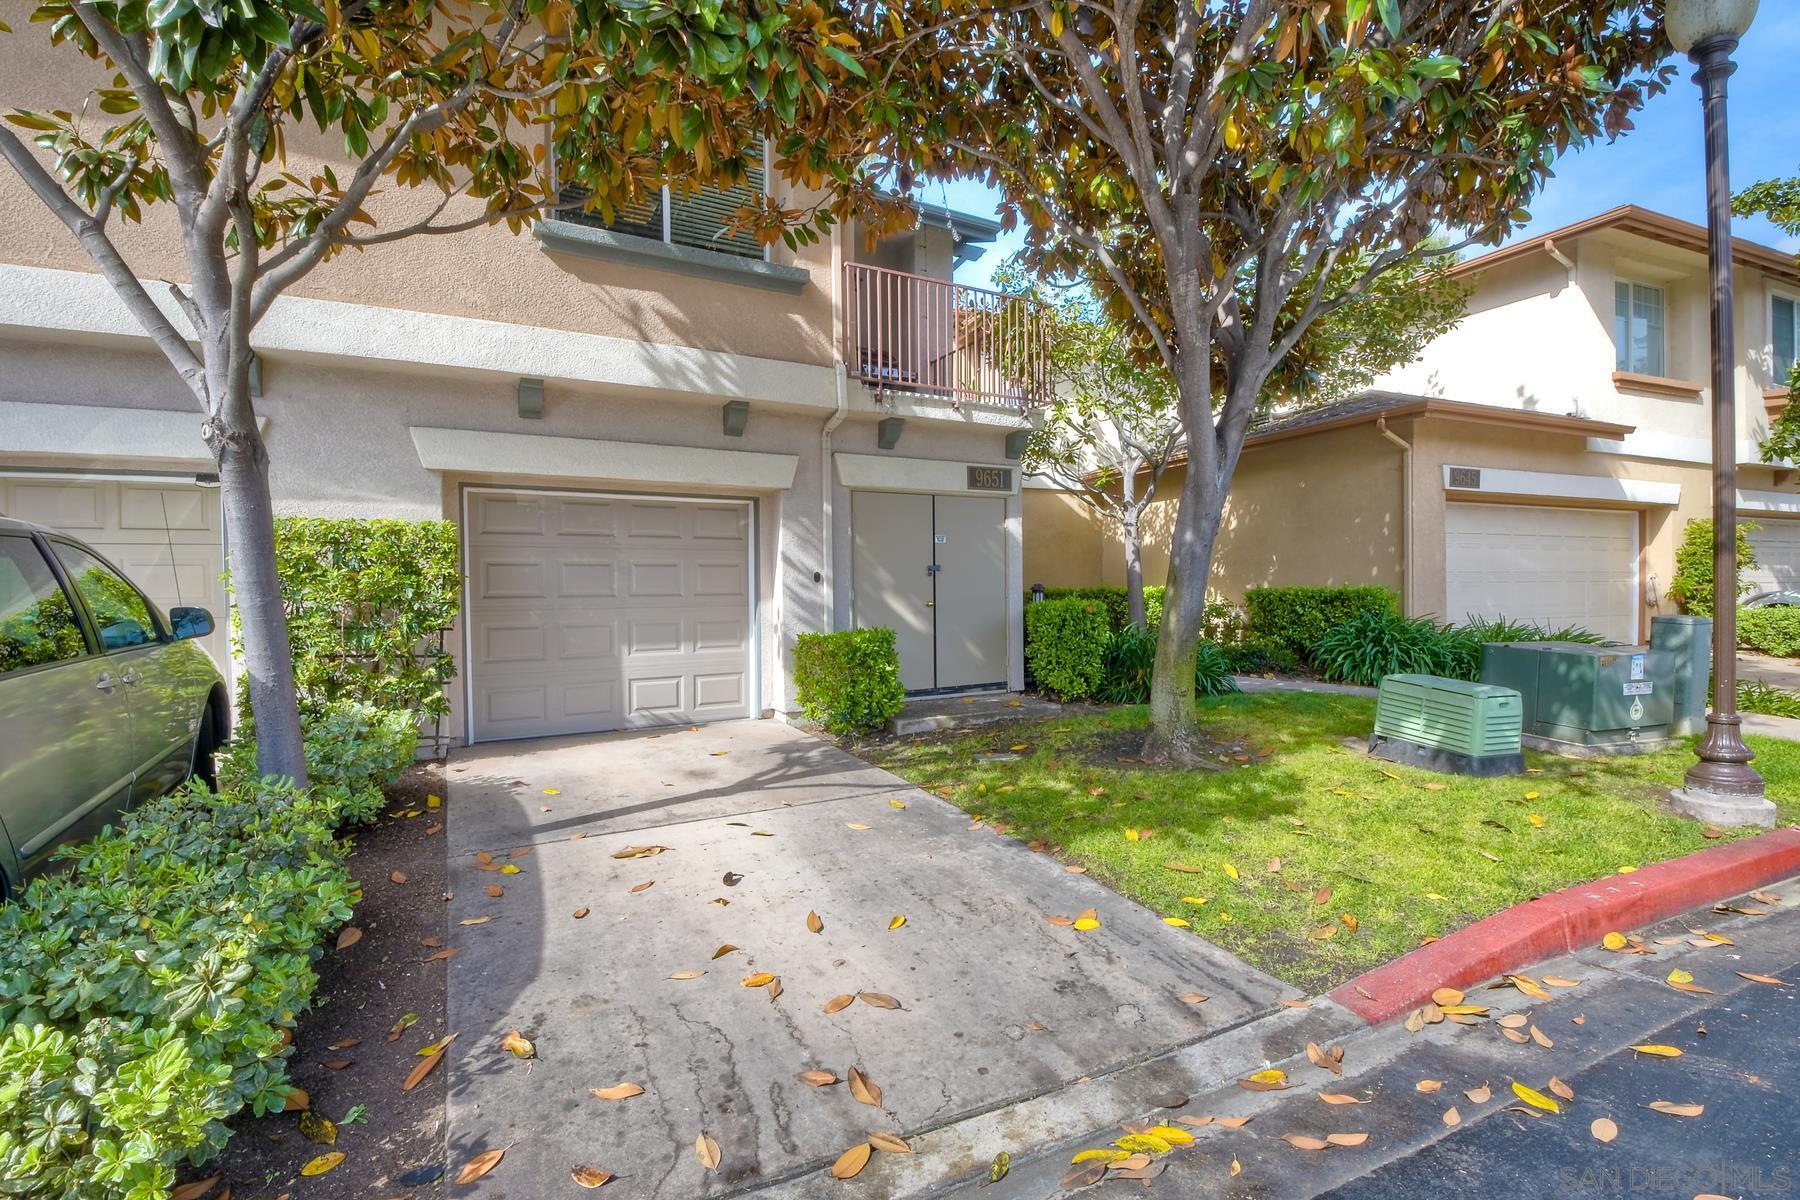 9651 West Canyon Terrace 2, San Diego, CA 92123